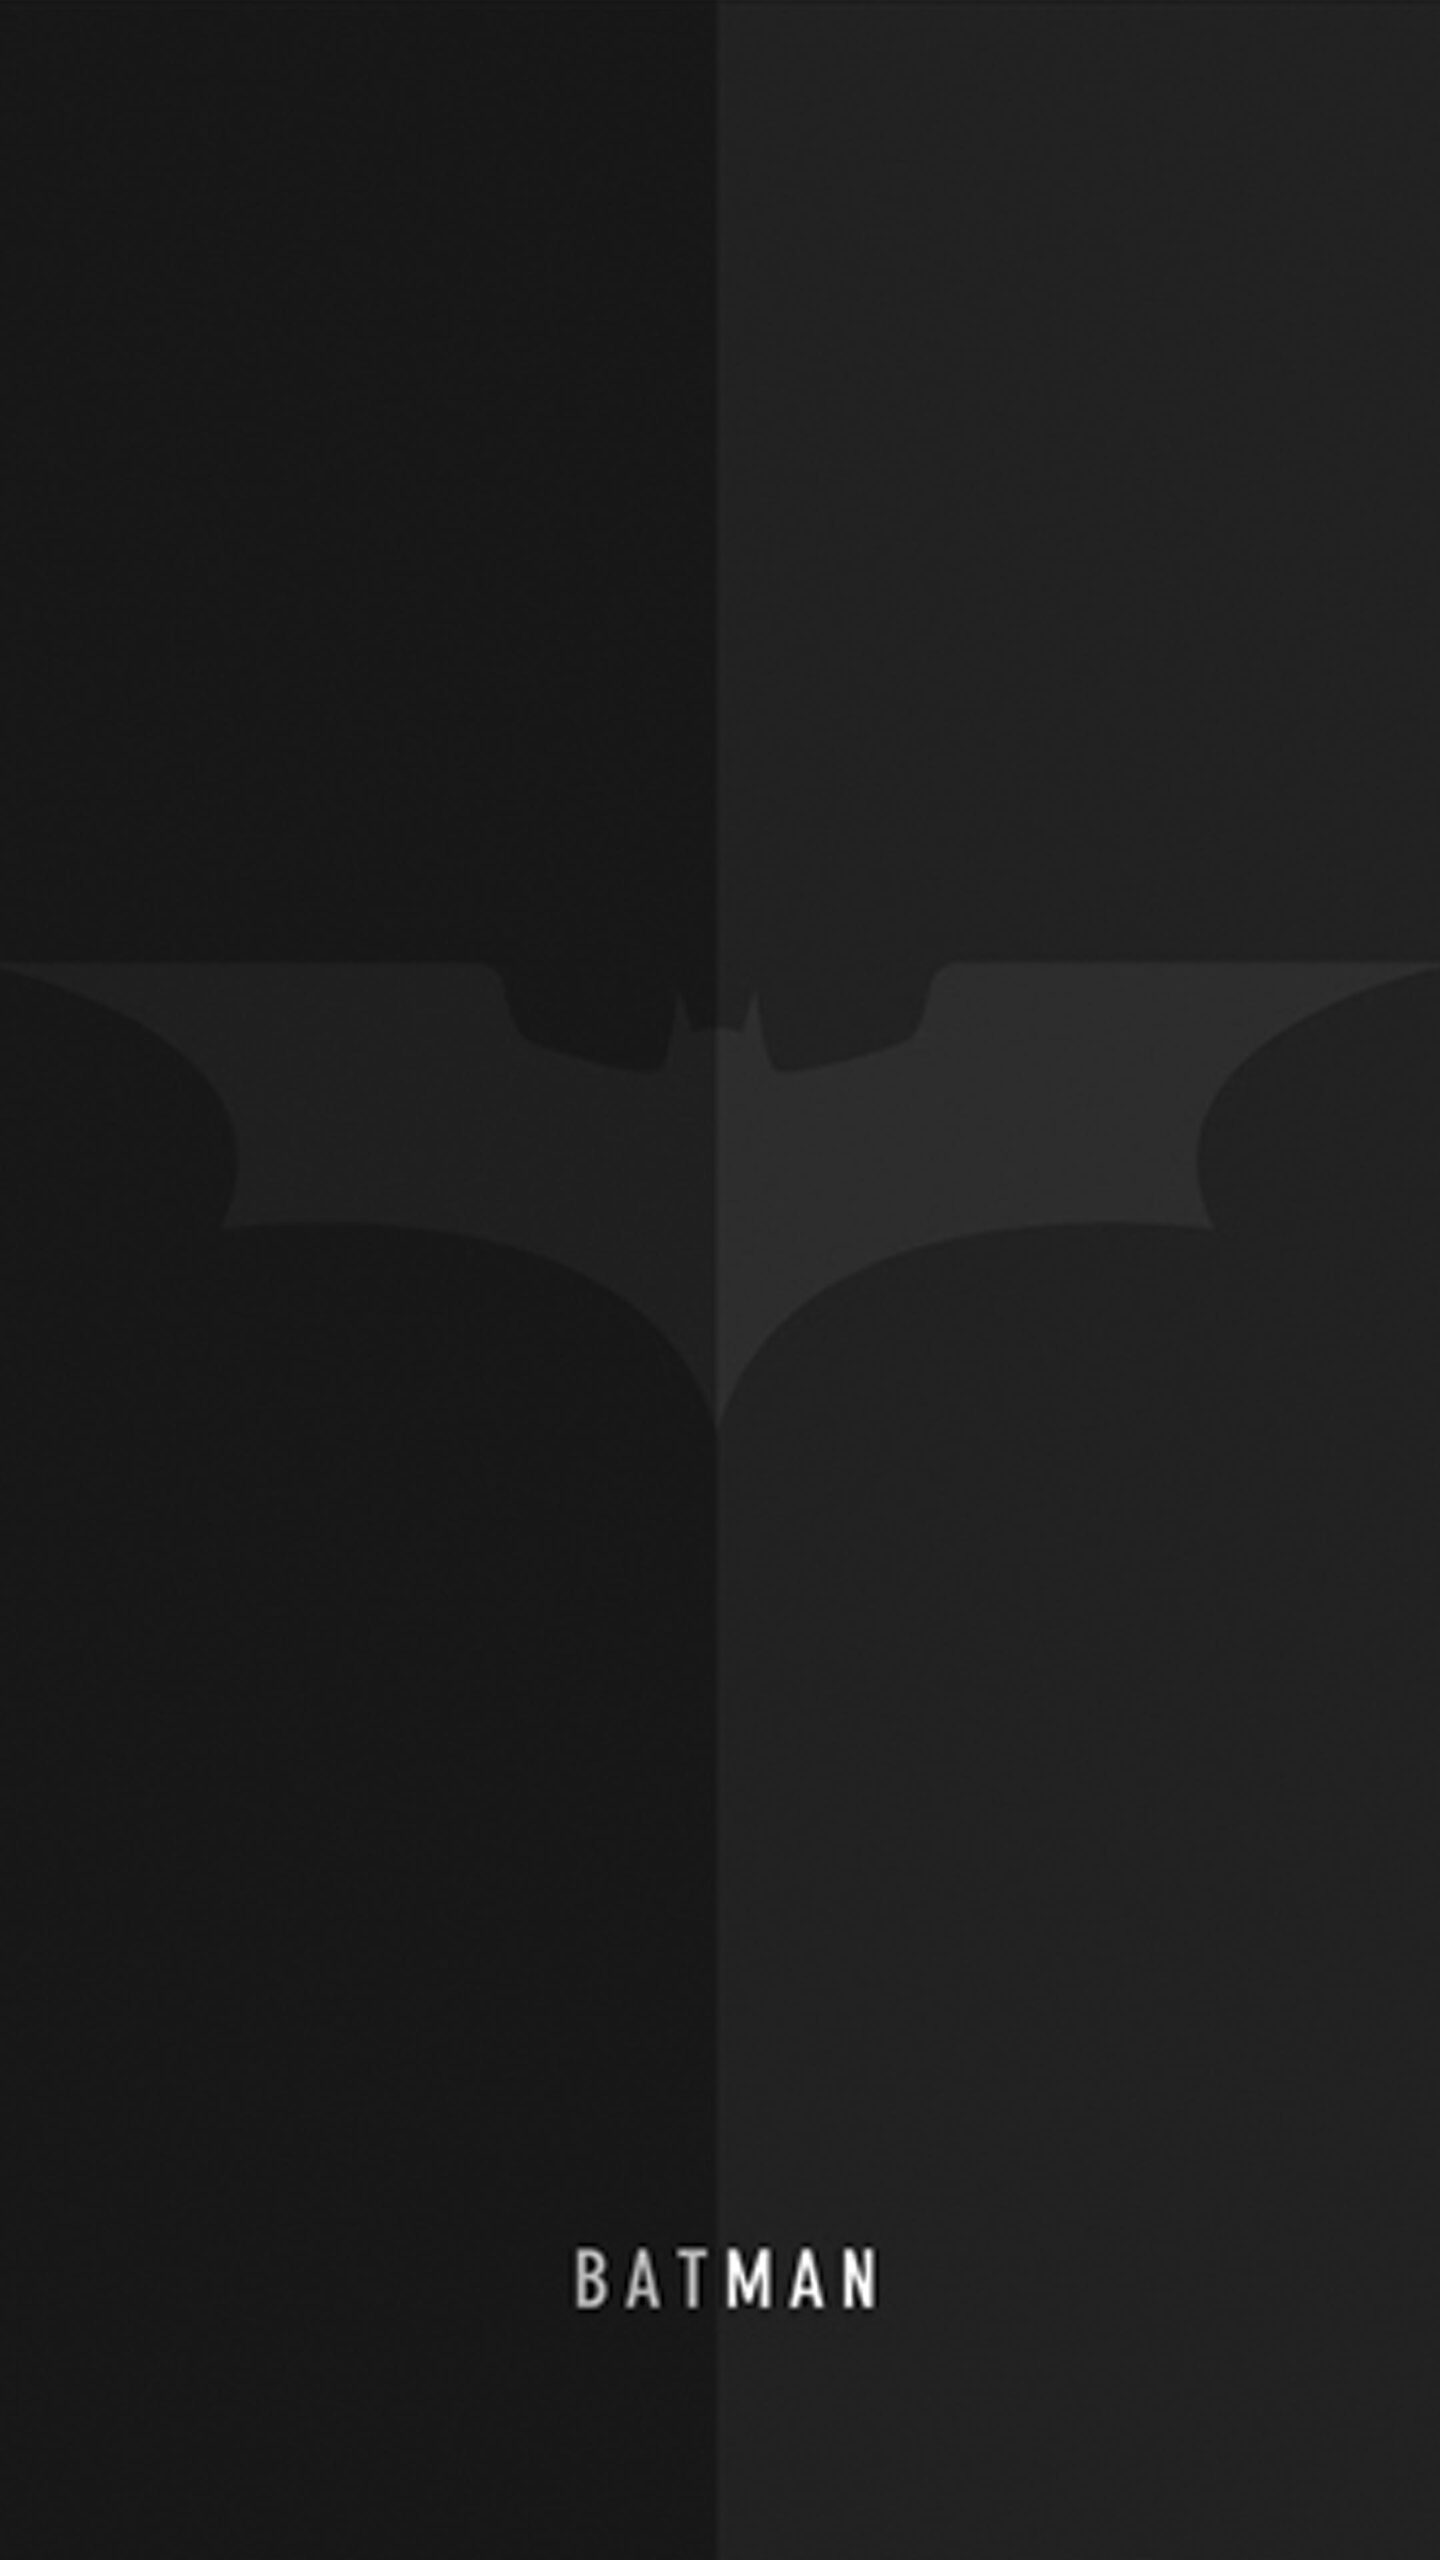 batman phone wallpaper